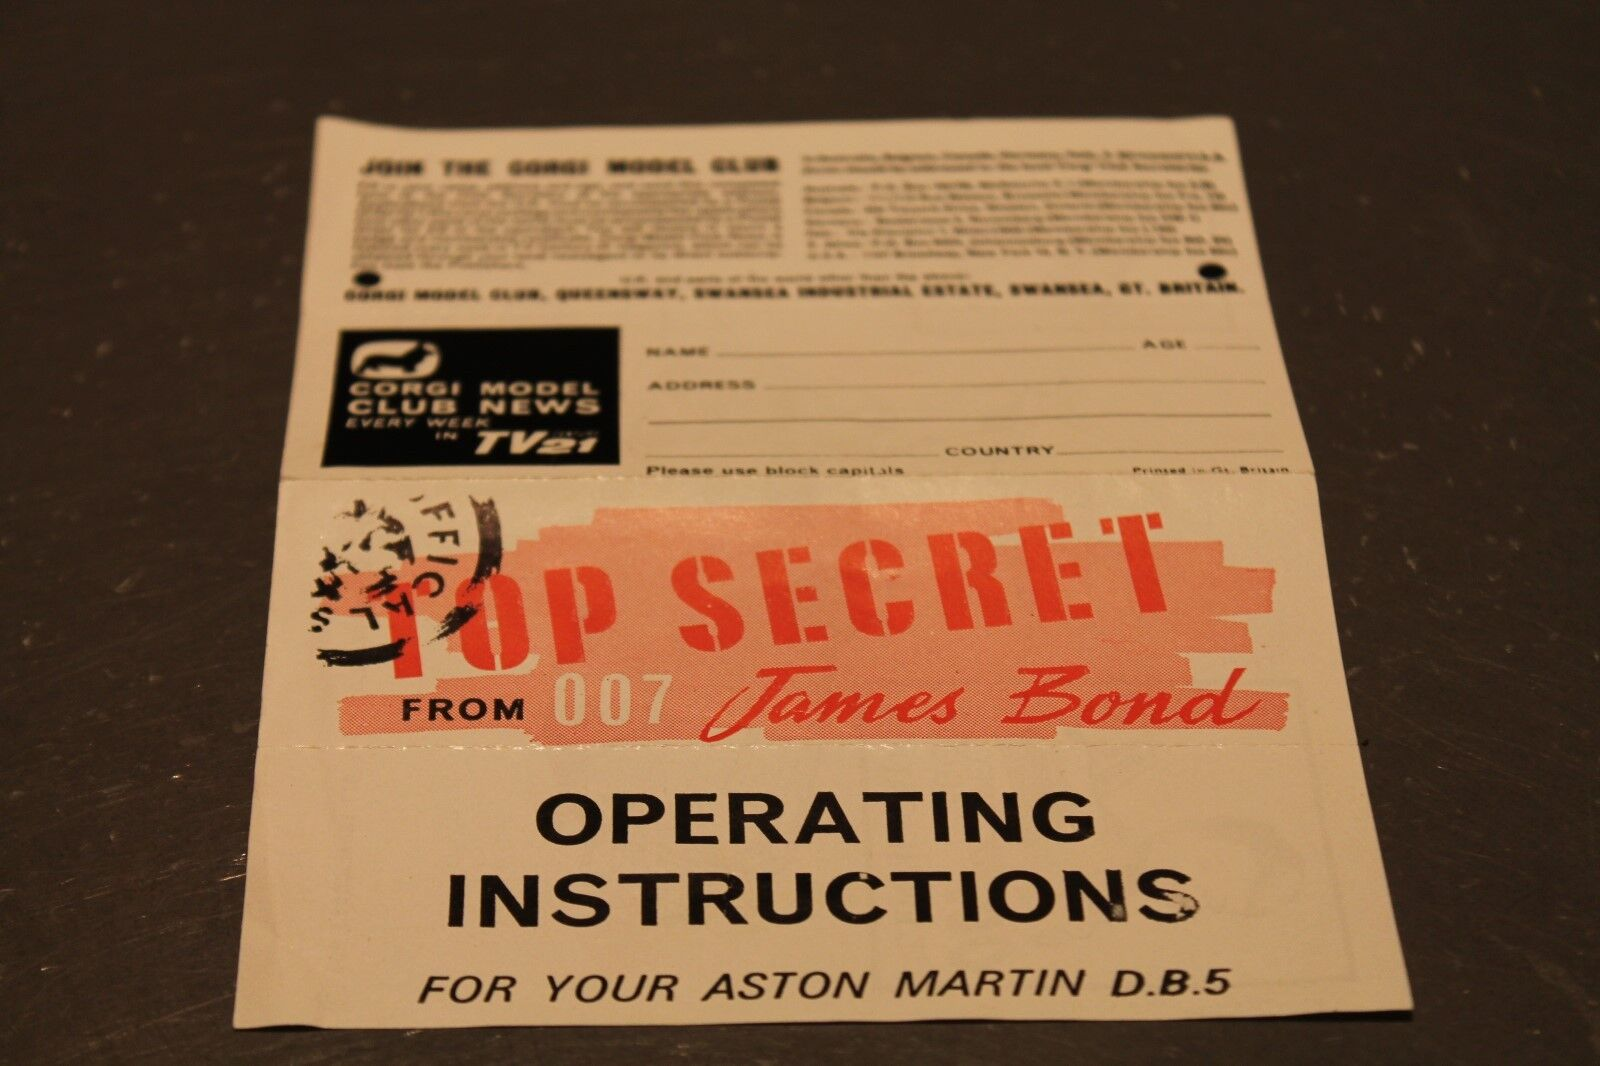 CORGI TOYS  Club leaflet & DESCRIPTION Aston Martin Martin Martin db5  Top Secret f1e2e0